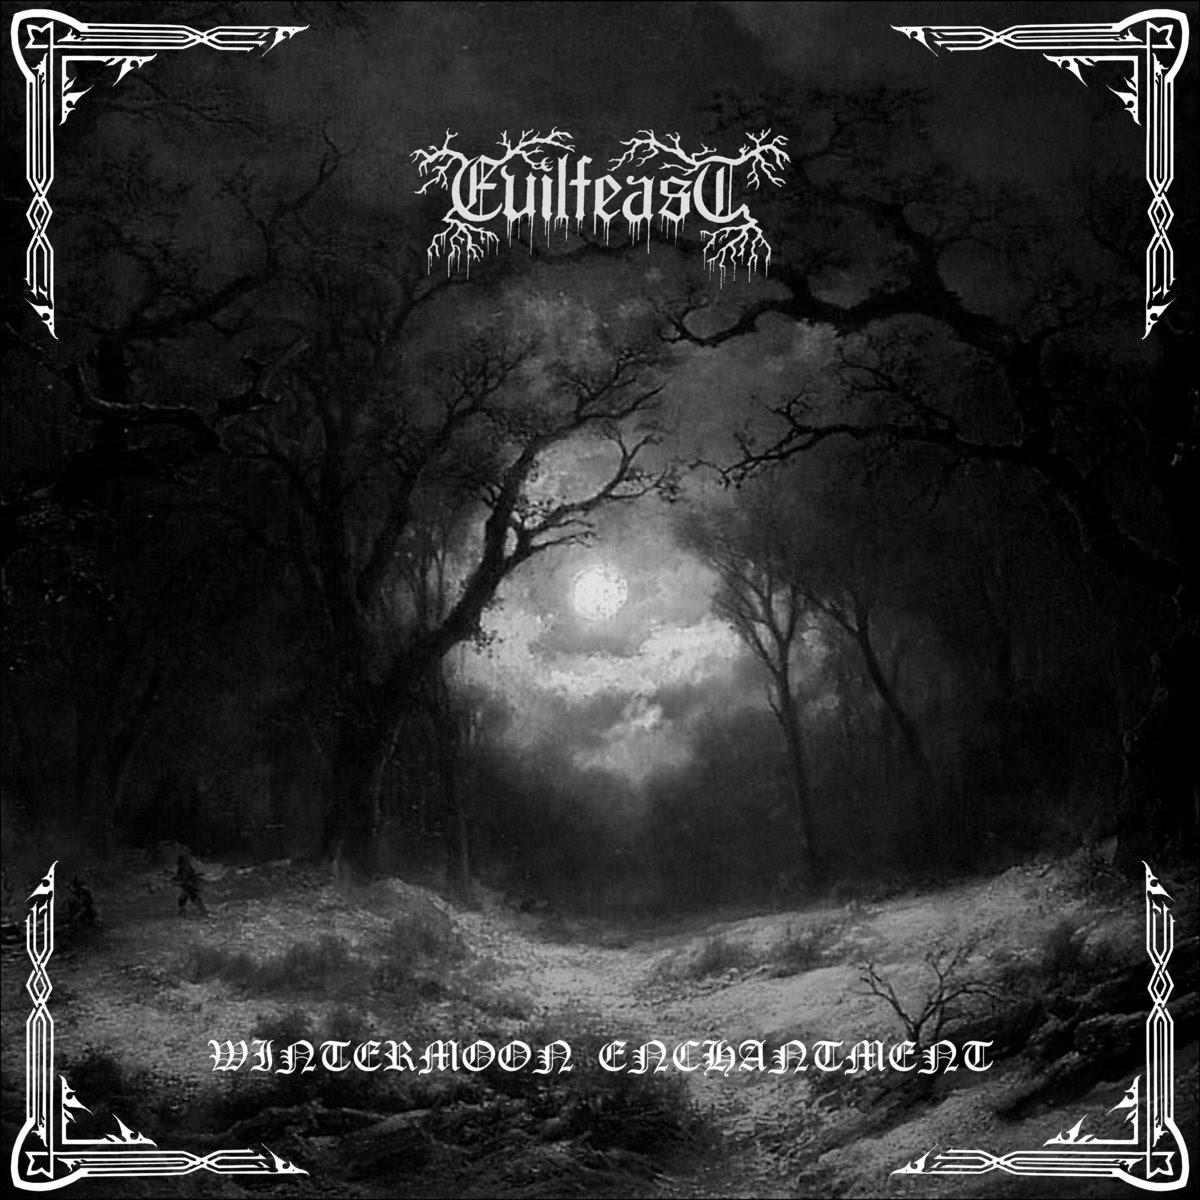 Evilfeast - Wintermoon Enchantment (2011)